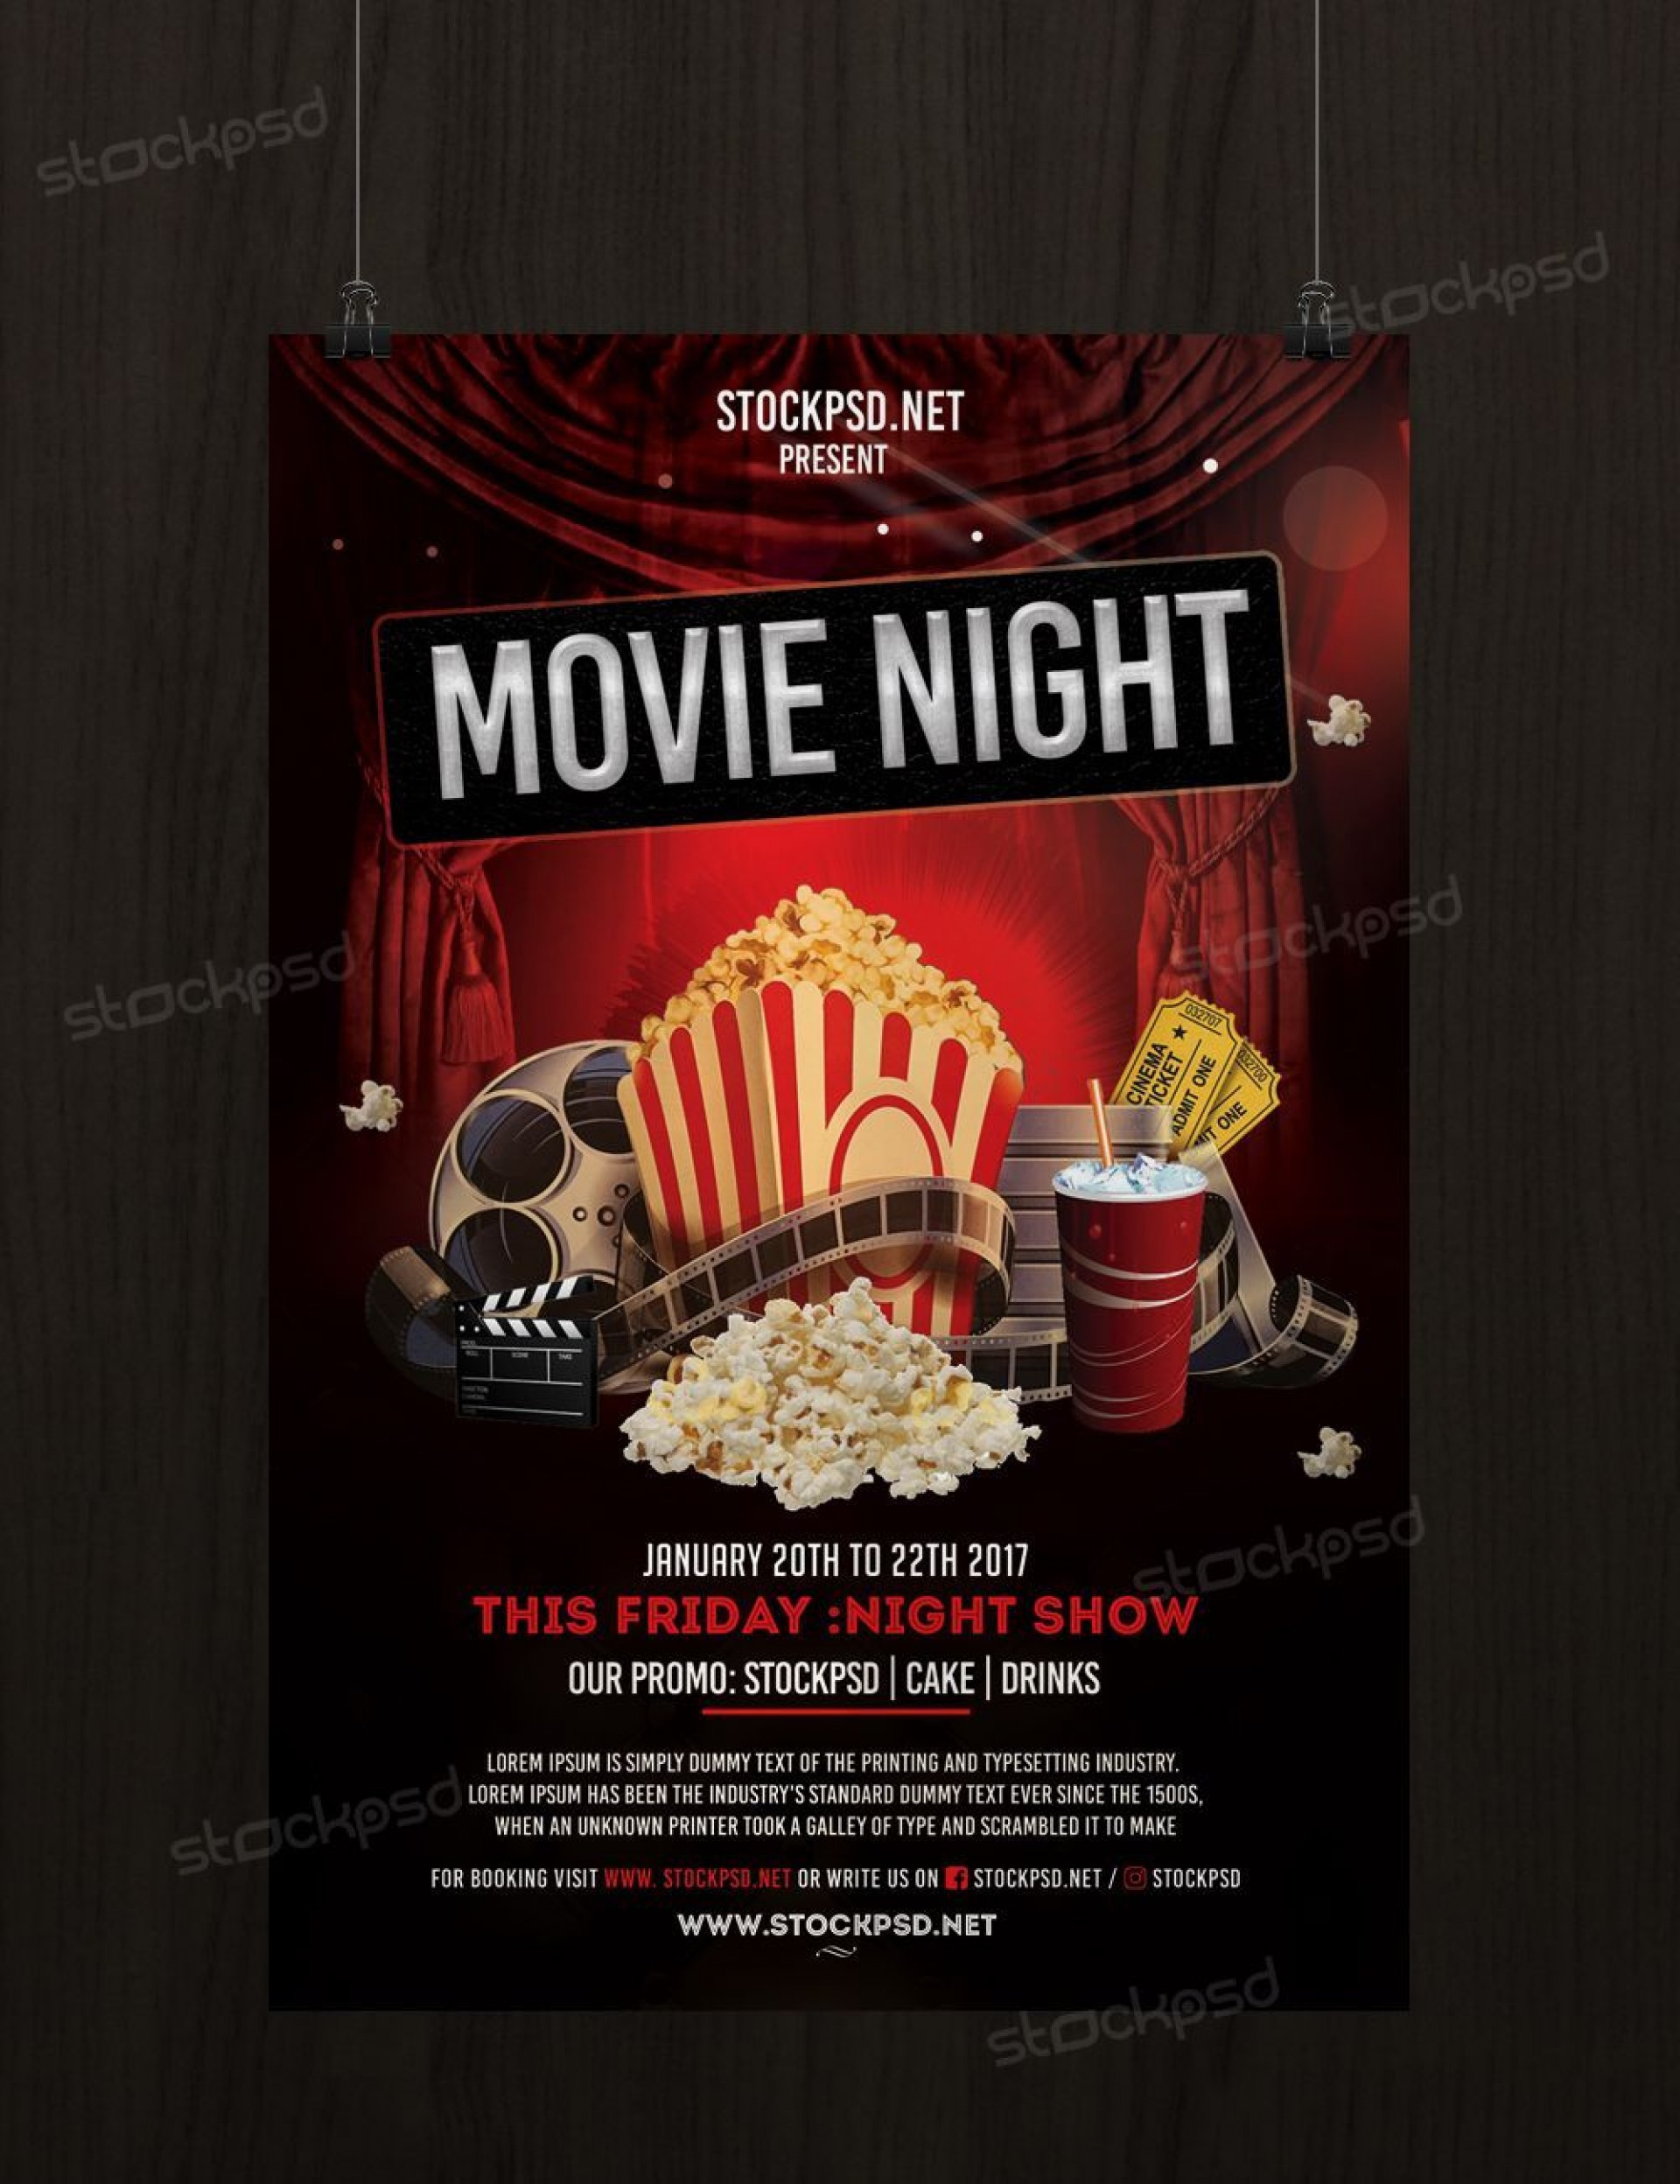 006 Rare Movie Night Flyer Template Inspiration  Editable Psd Free1920